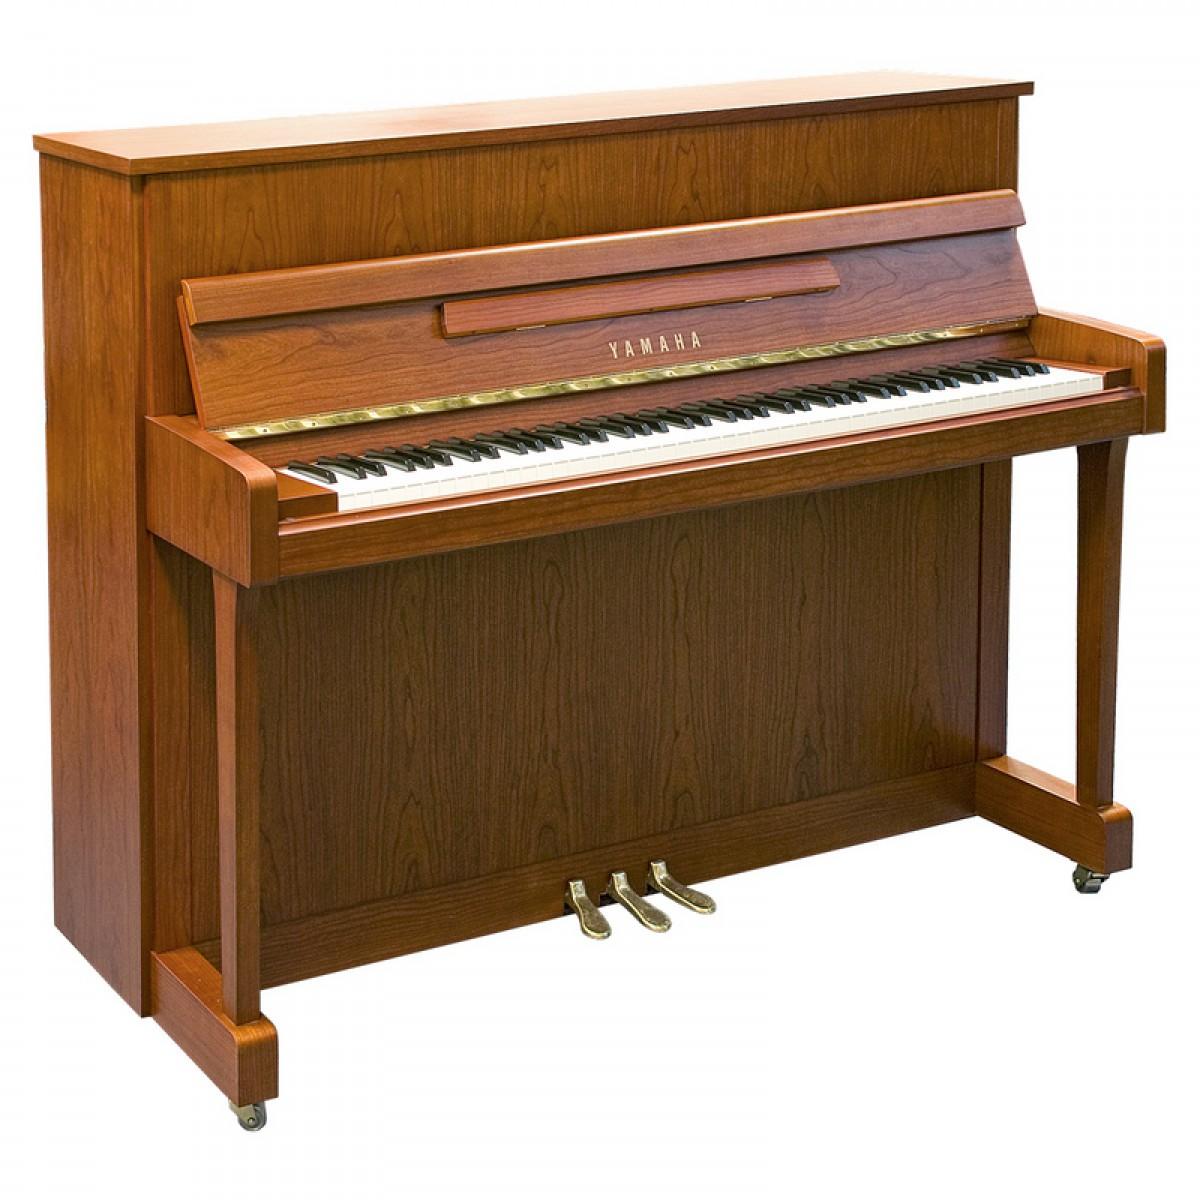 yamaha-b2-klavier-kirsch-holz